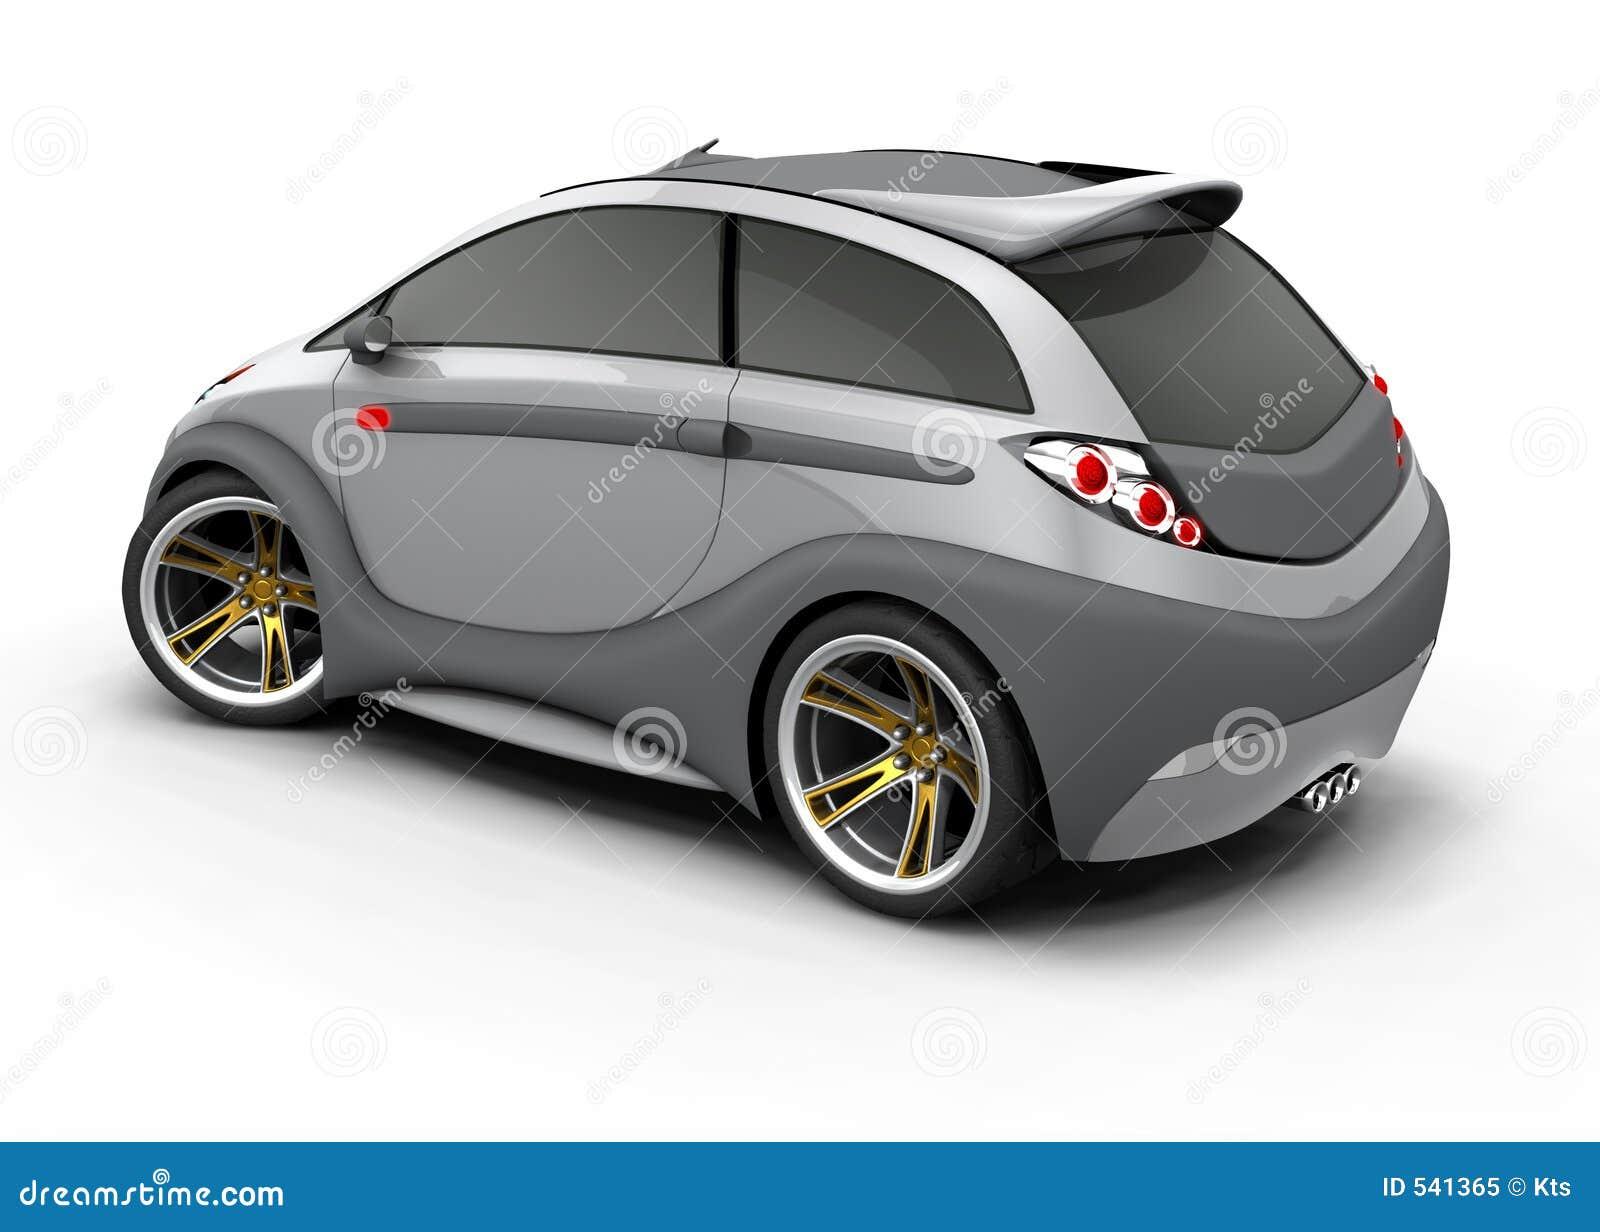 Download 3d汽车构思设计 库存例证. 插画 包括有 通信工具, 轿车, 概念, 技术, 自动, 设计, 斜背式的汽车 - 541365